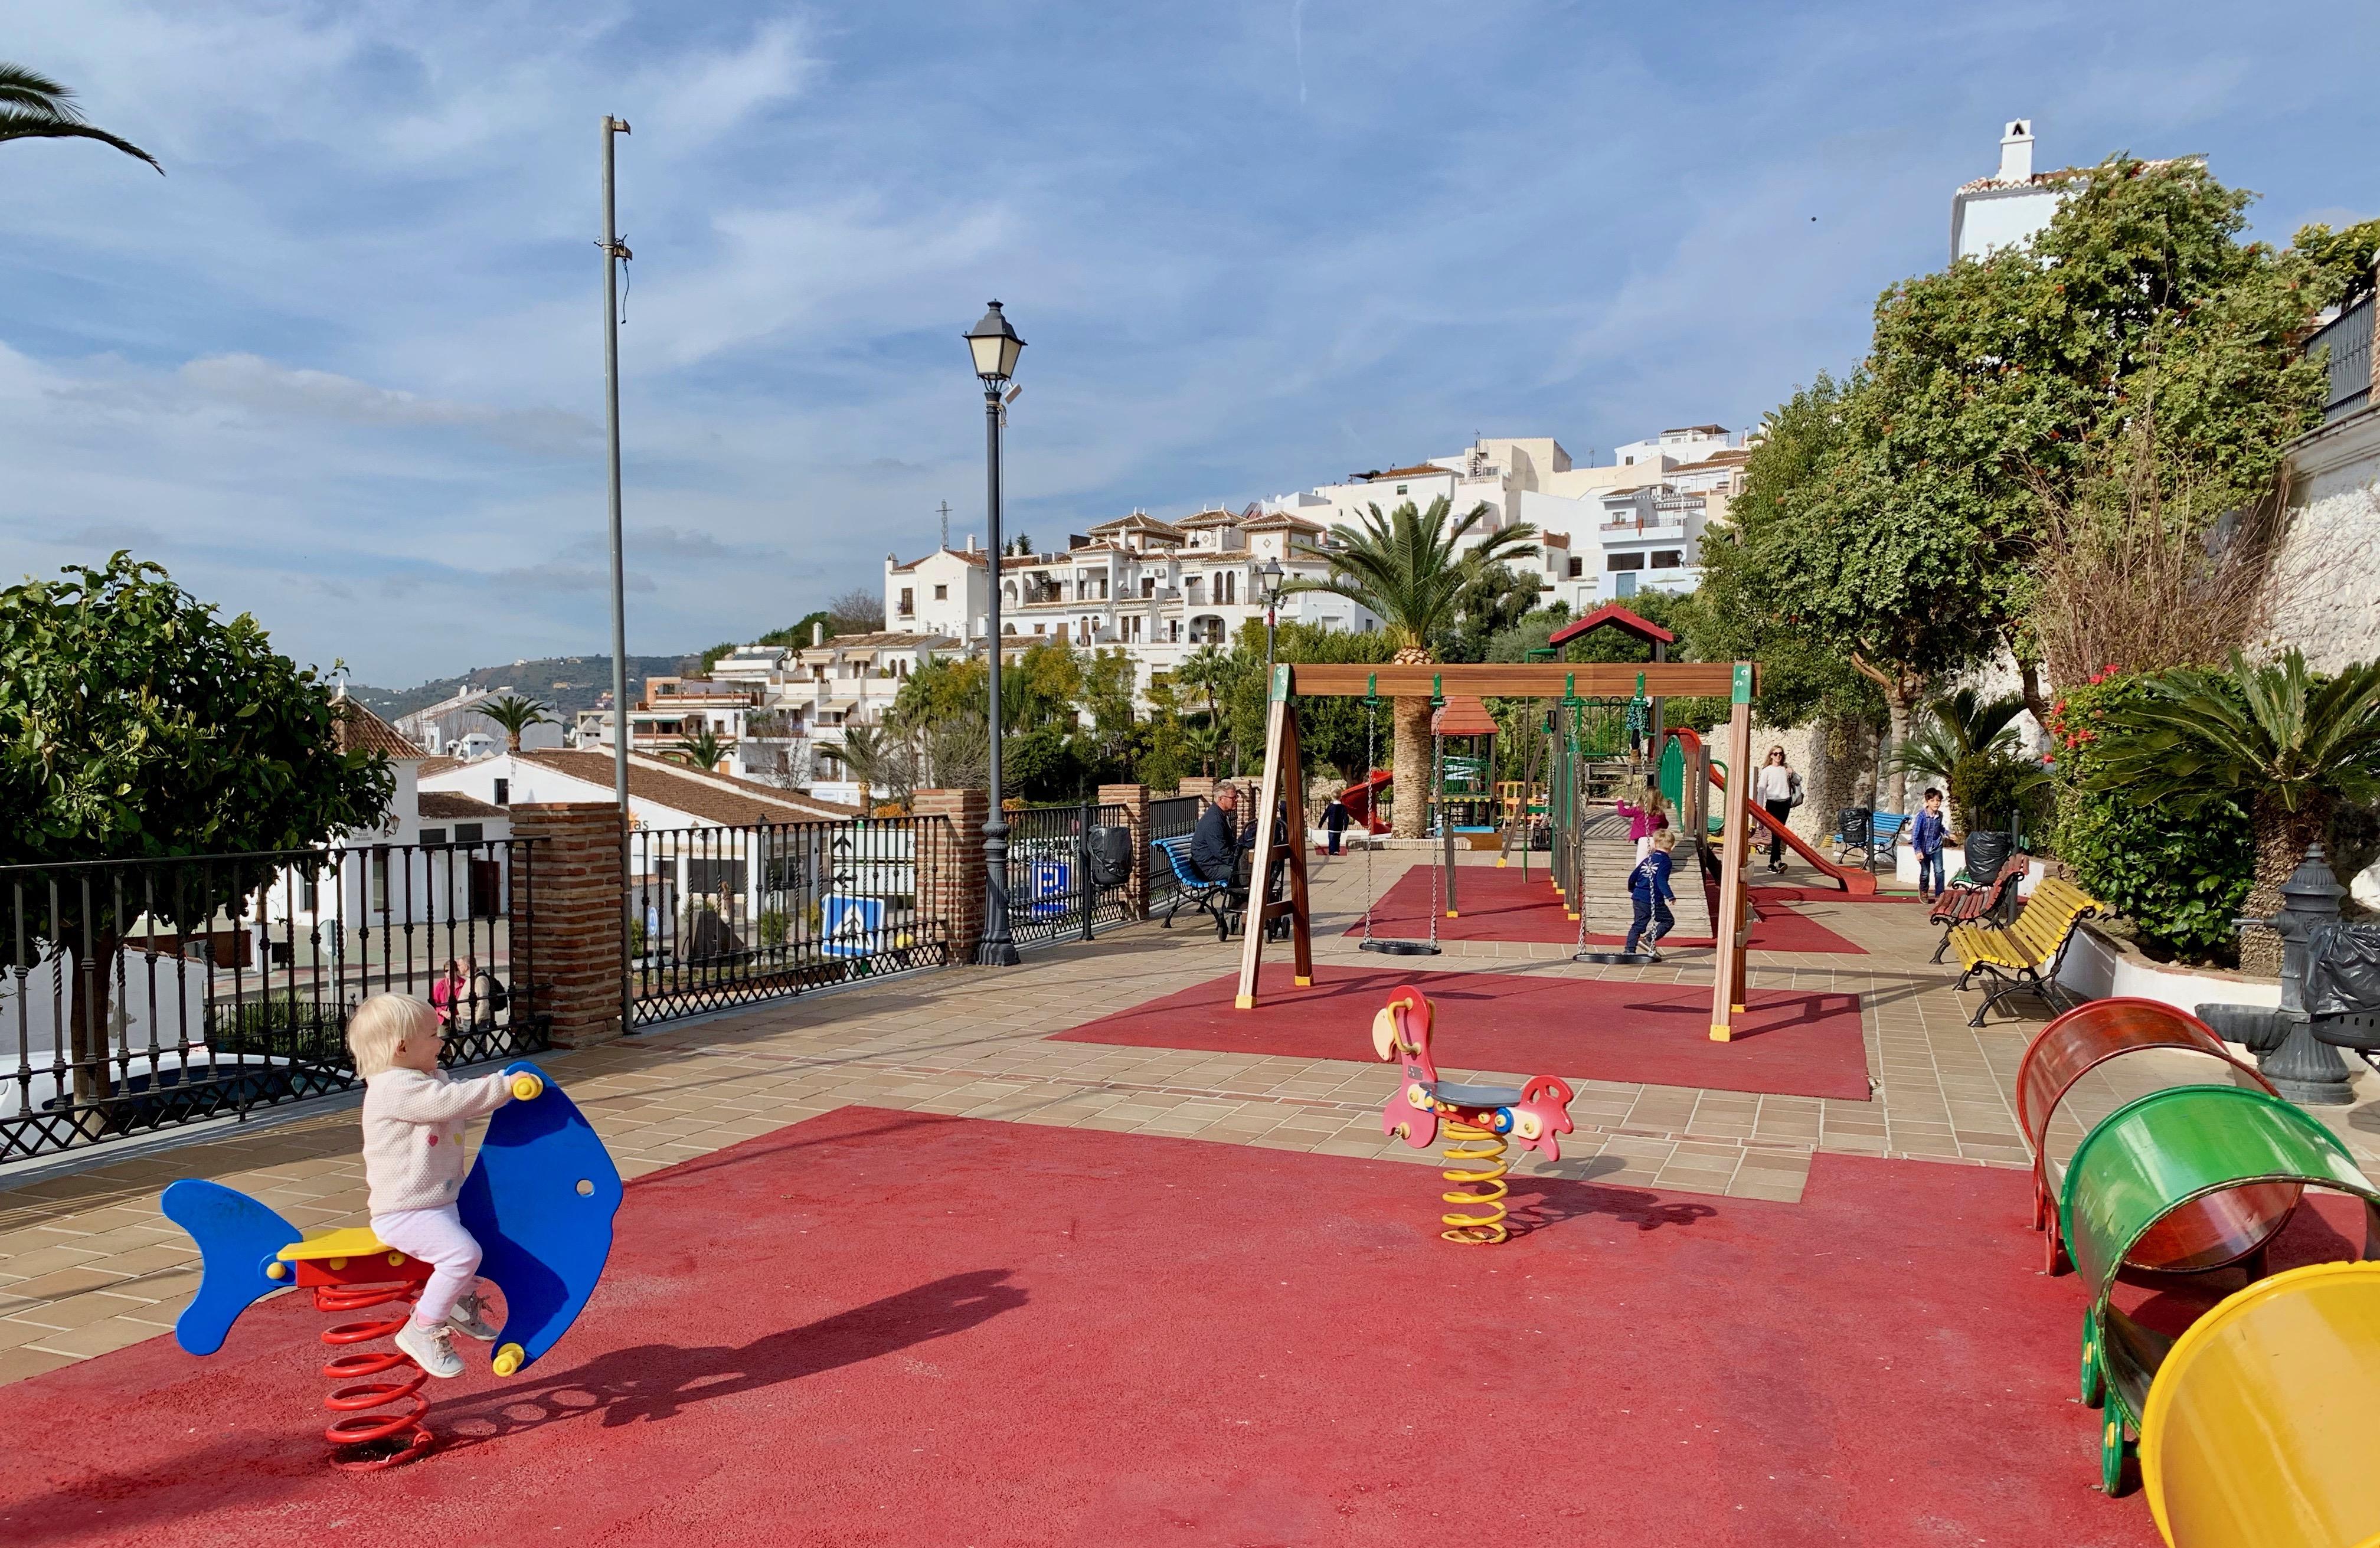 Playground in Frigiliana